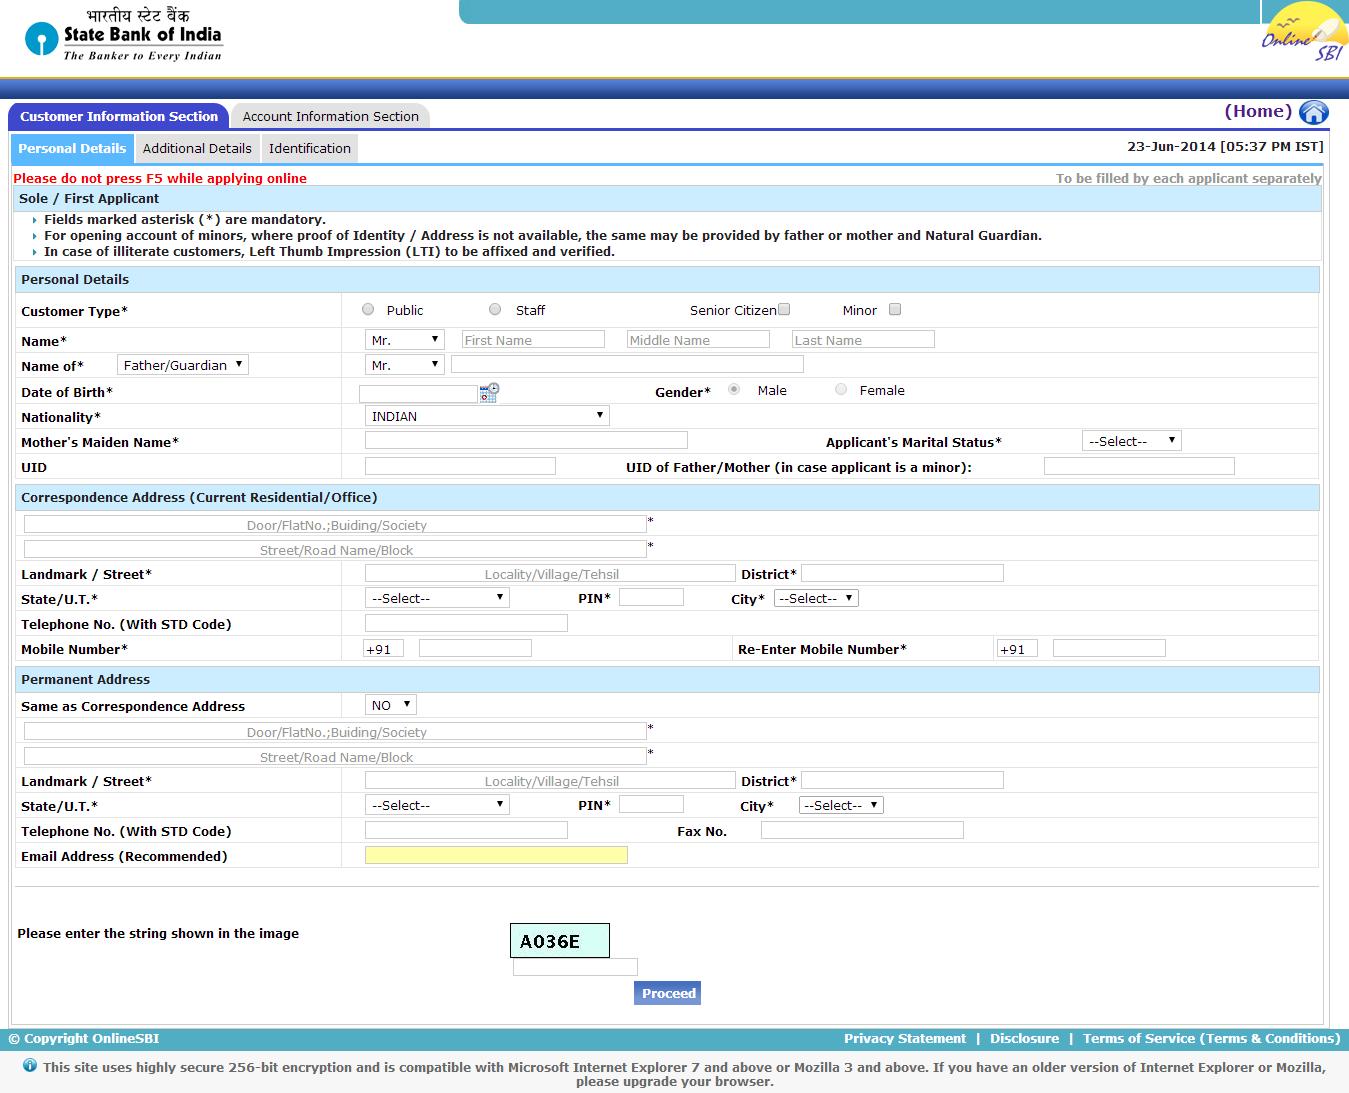 Incoming wire transfer fee cibc - info site Free Warez on site ...